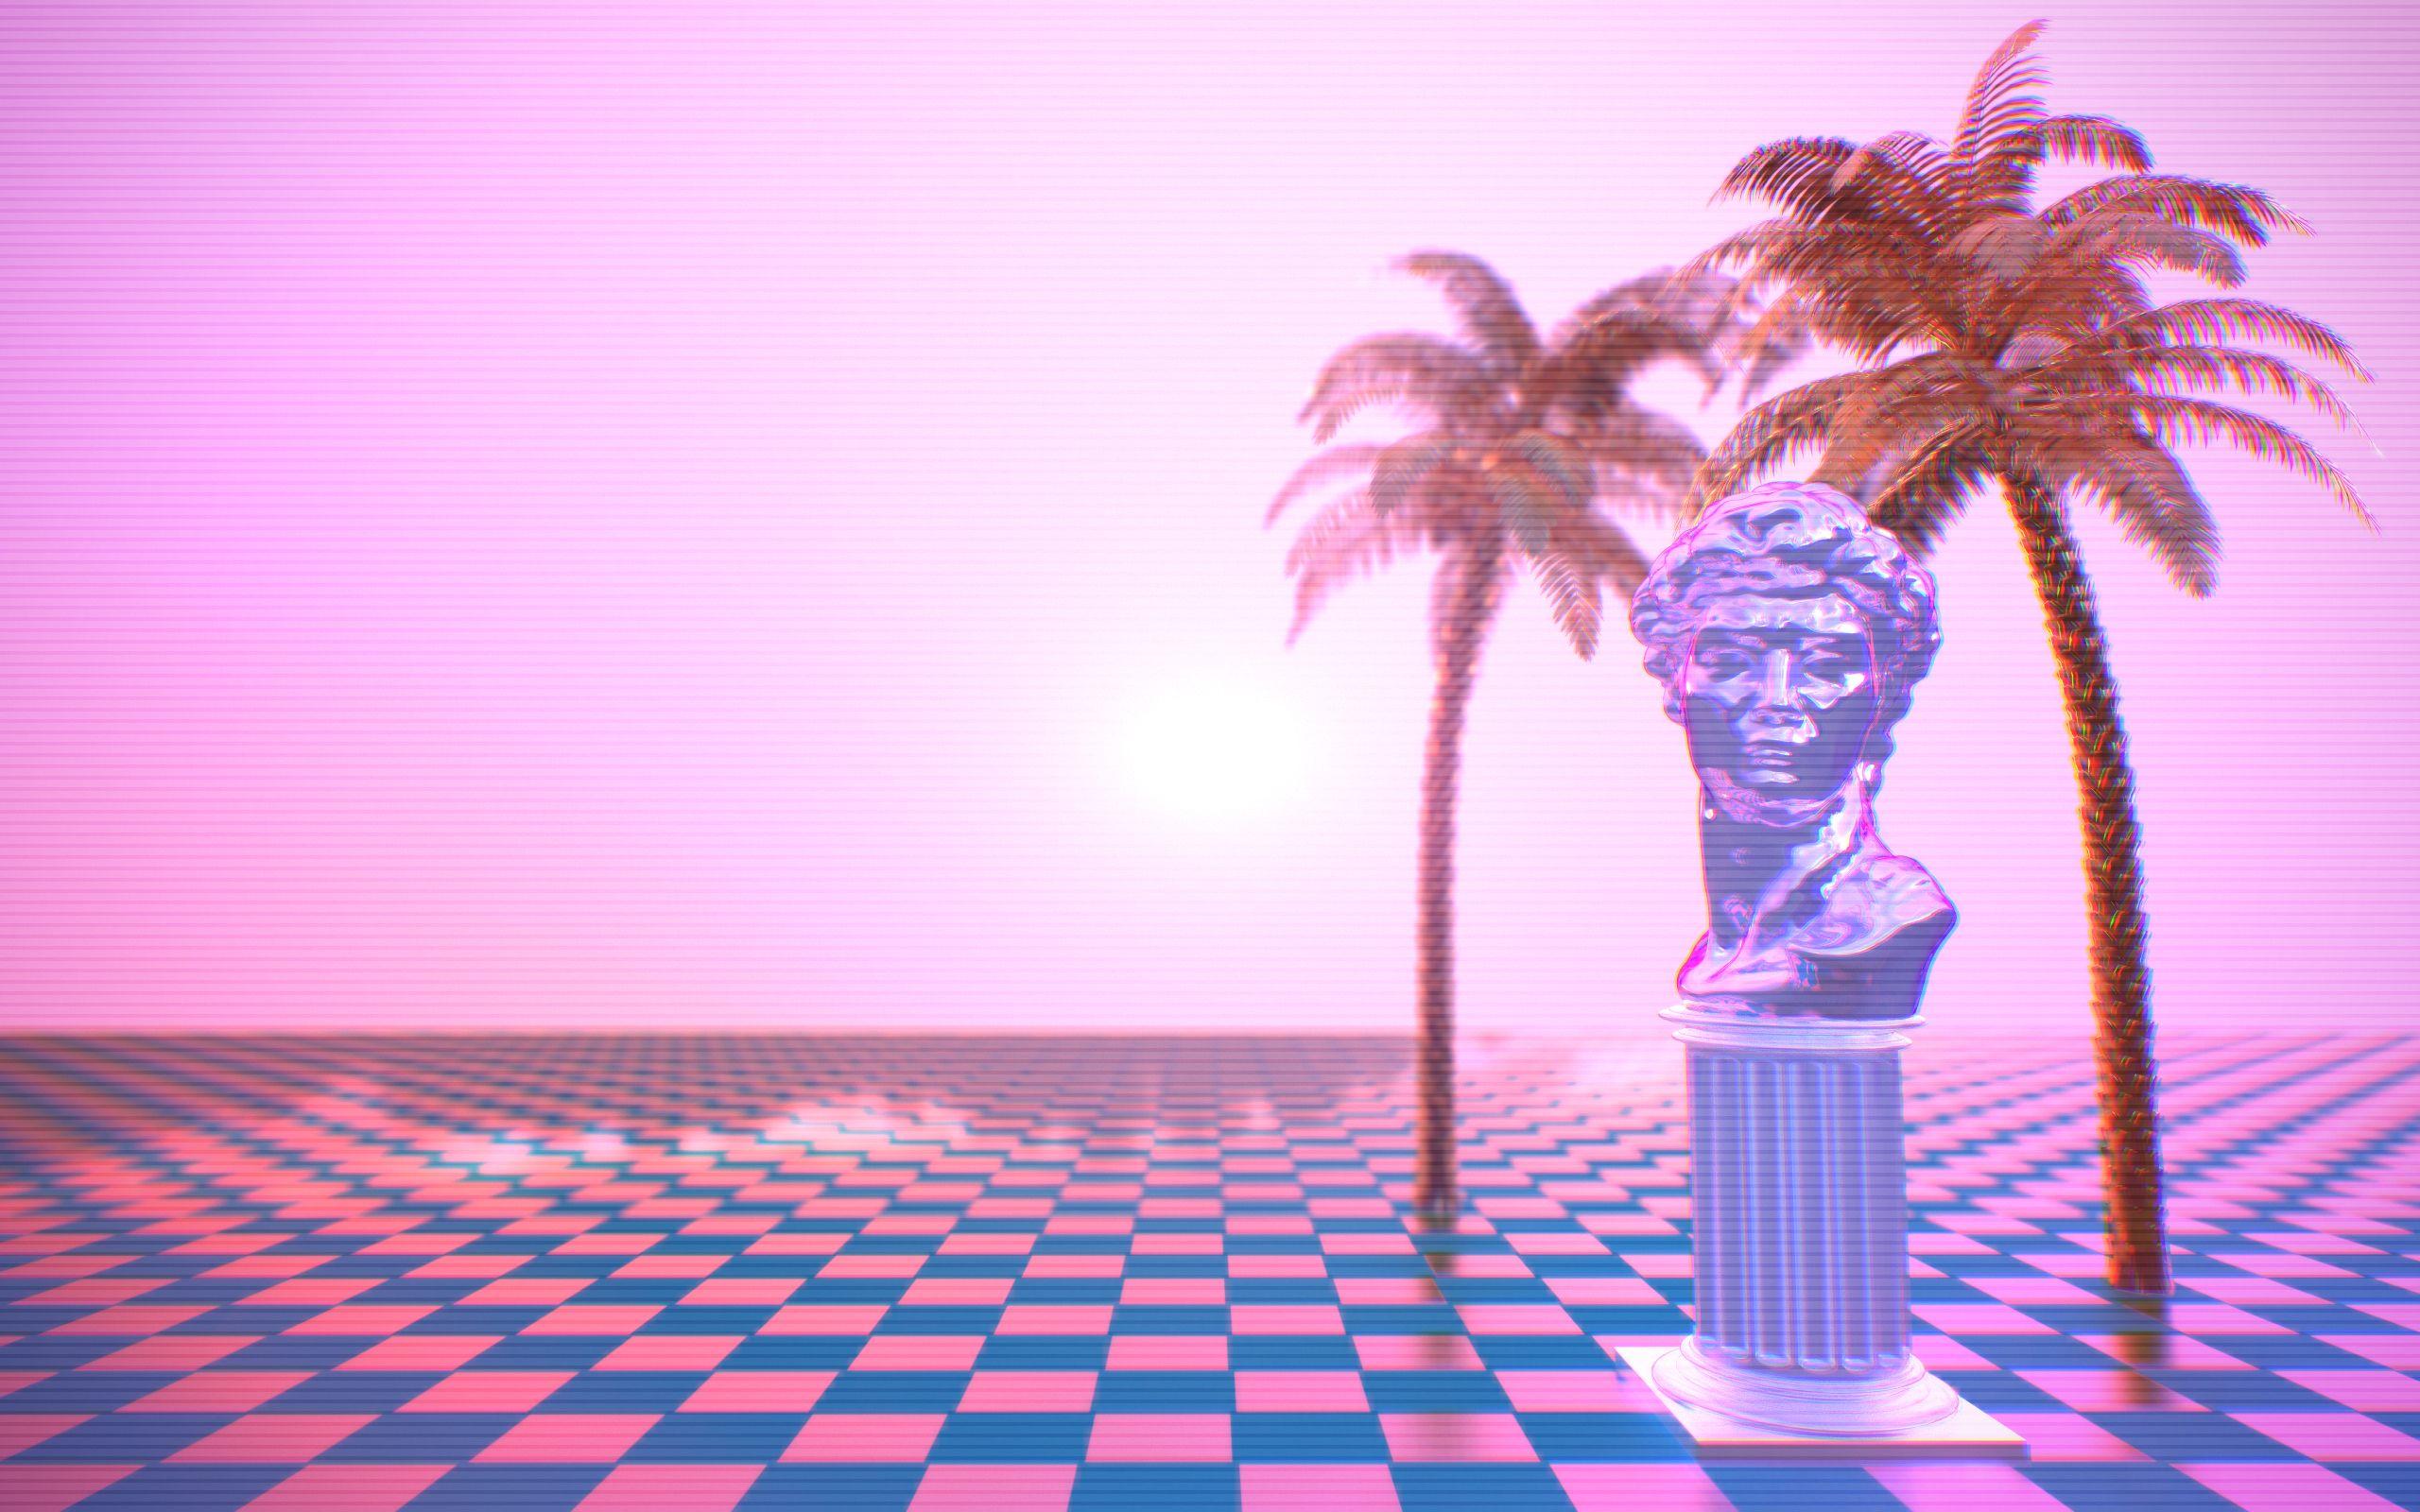 vaporwave desktop